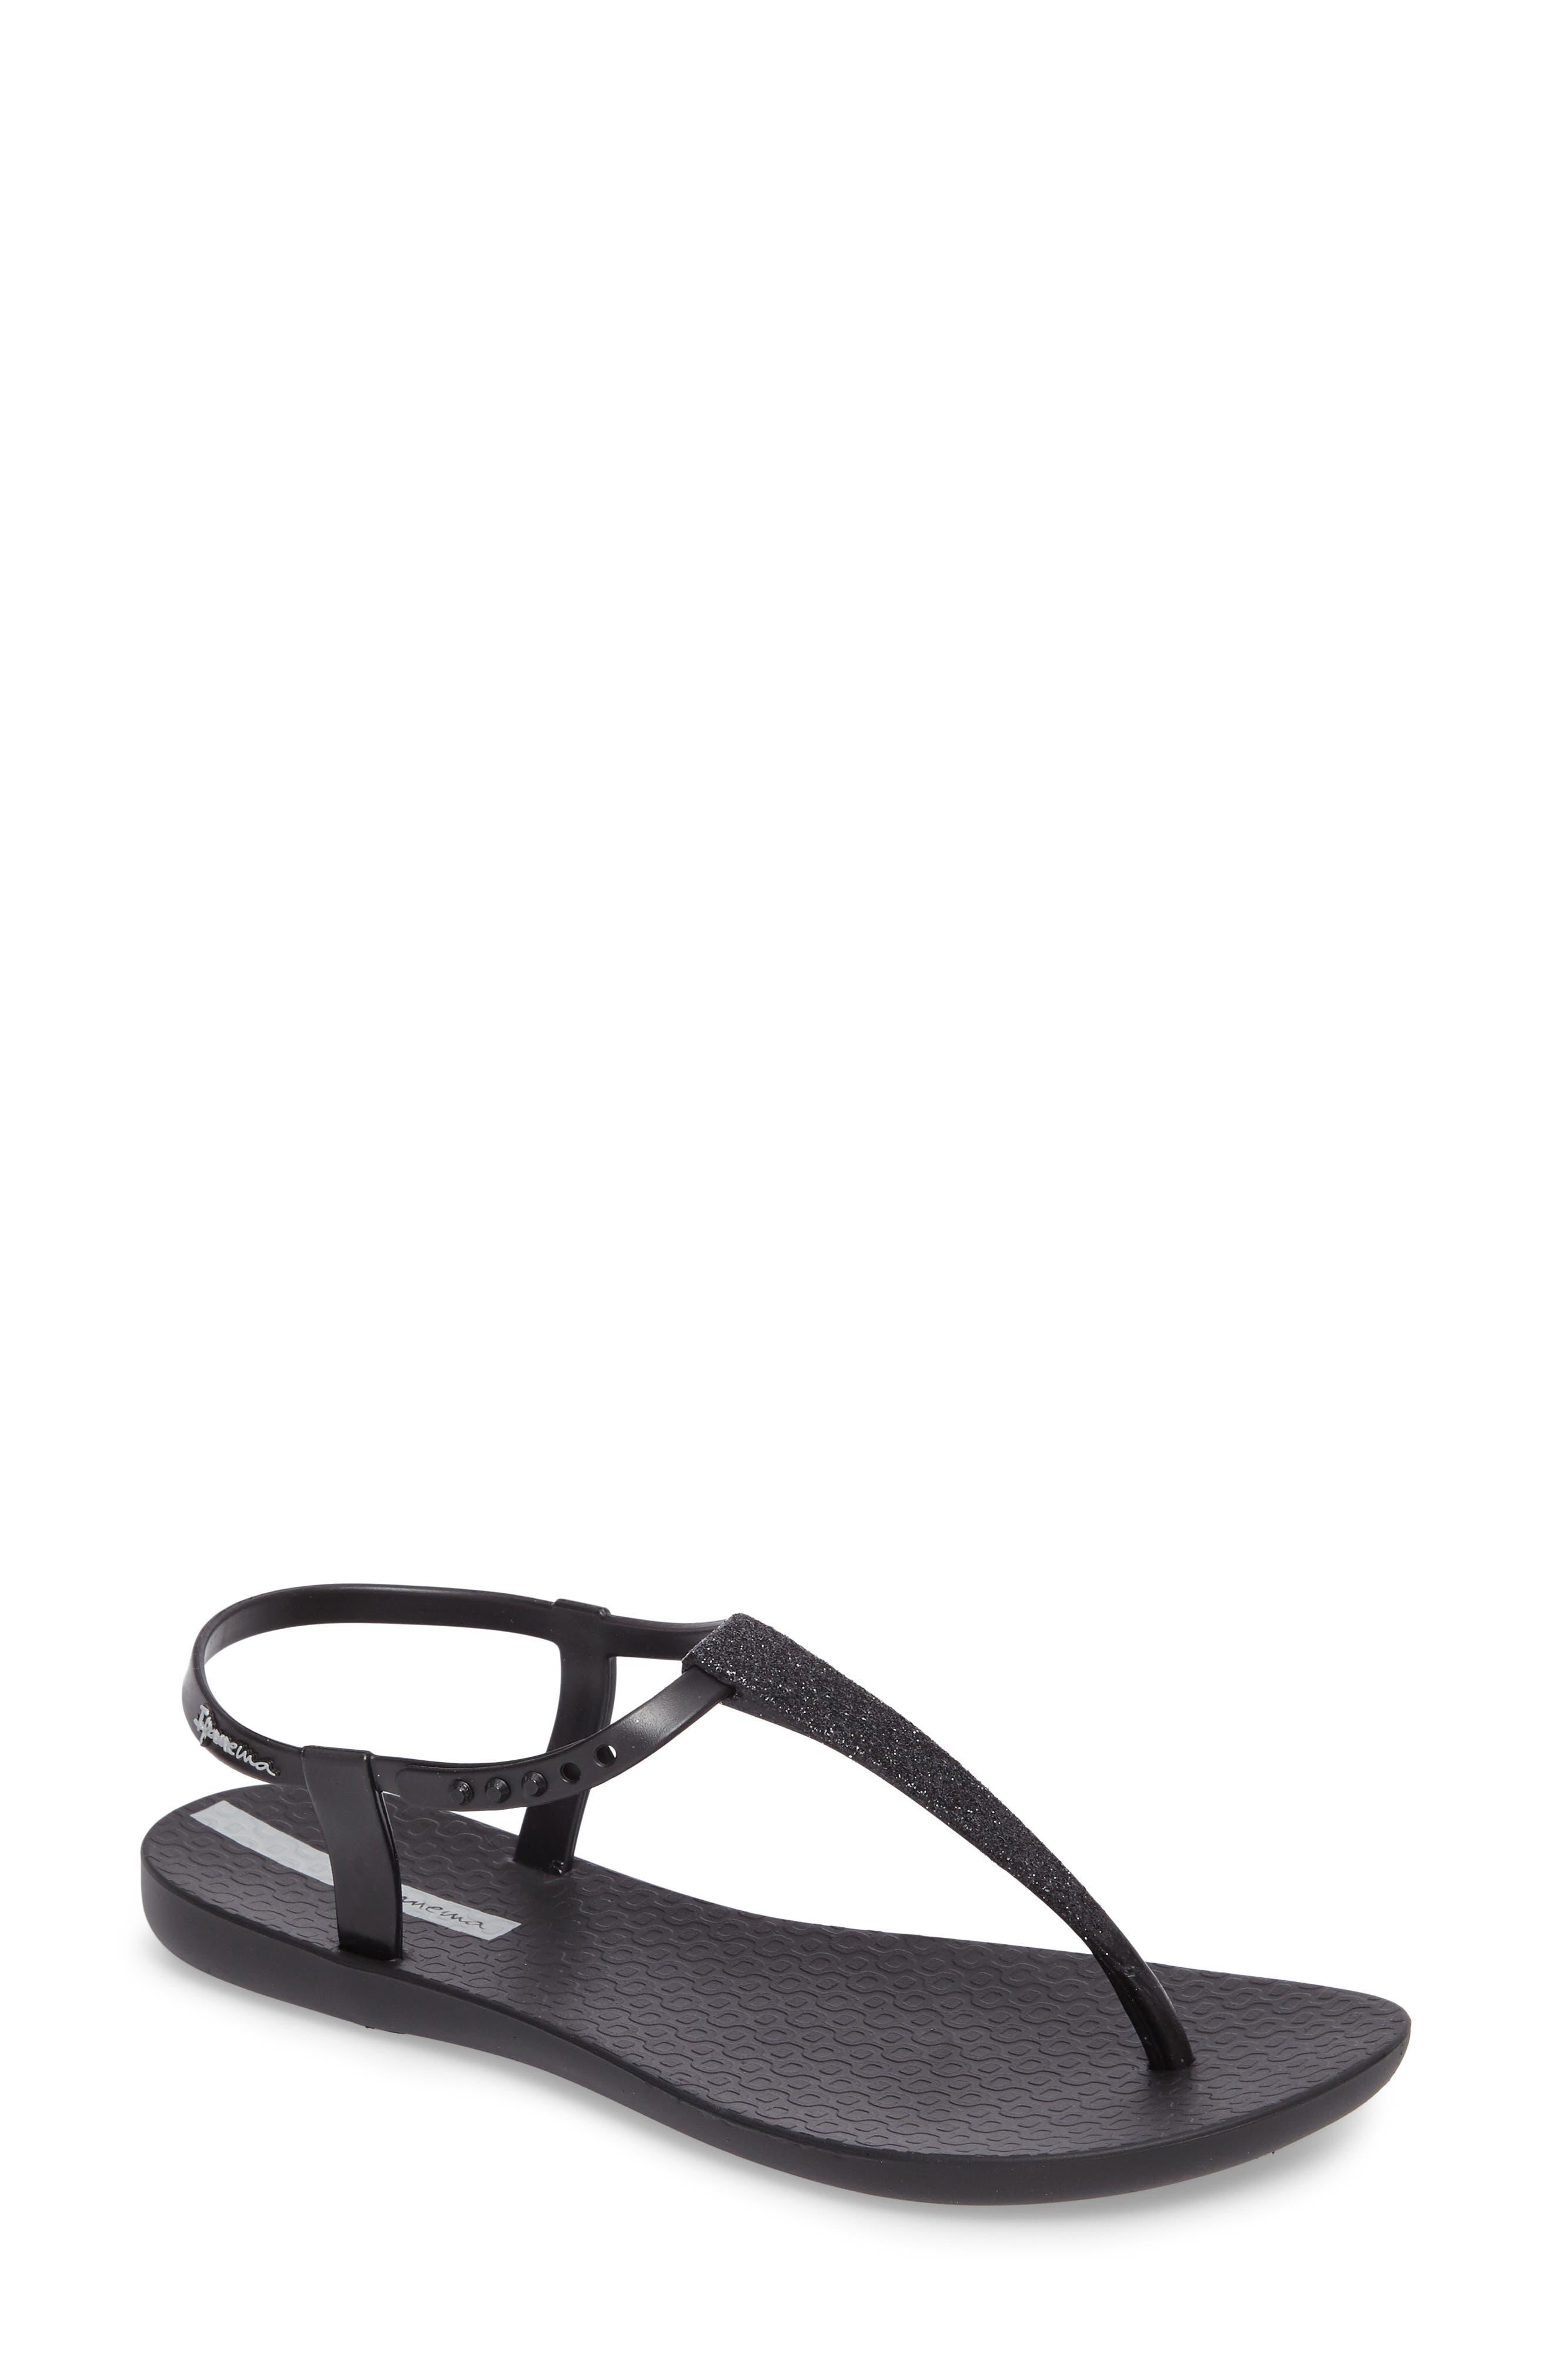 Shimmer Sandal,                             Main thumbnail 1, color,                             001